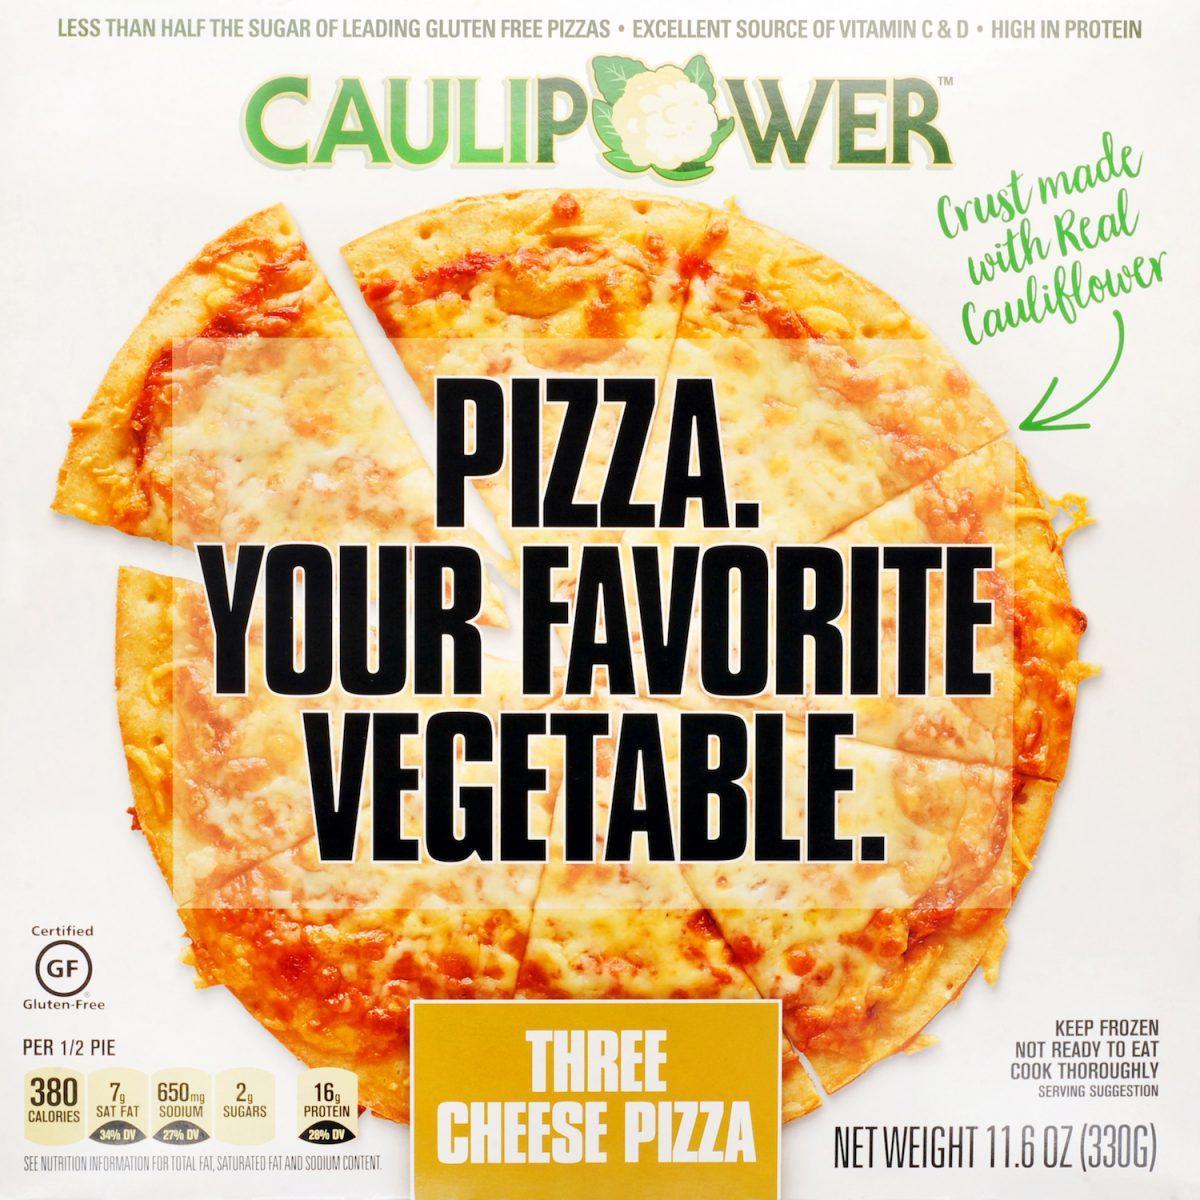 Cauliflower Pizza Crust Frozen  Caulipower How This Corporate Executive Left Her